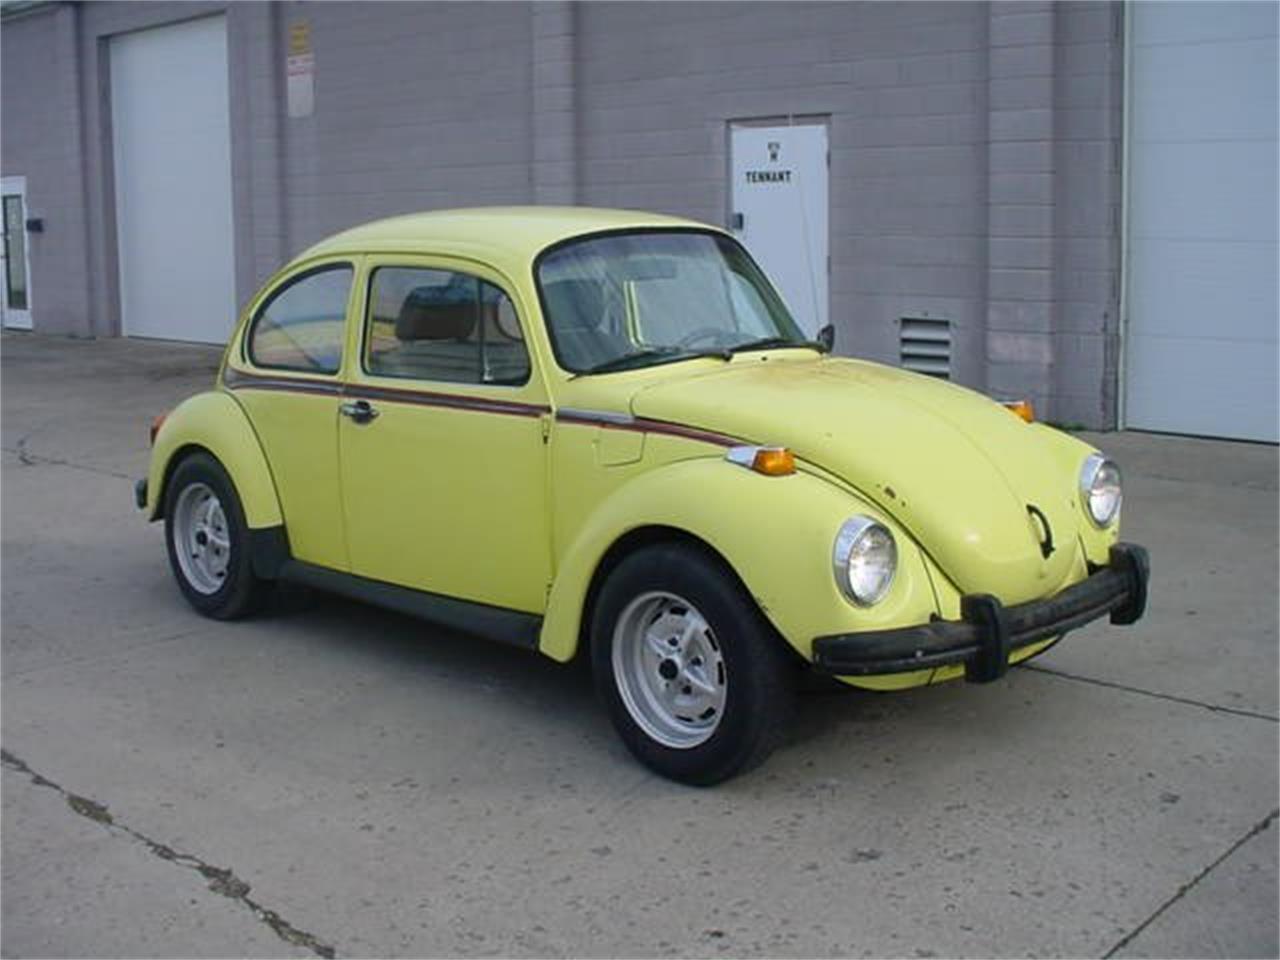 VW AirCooled Beetle Arm Rest Bracket 58-67